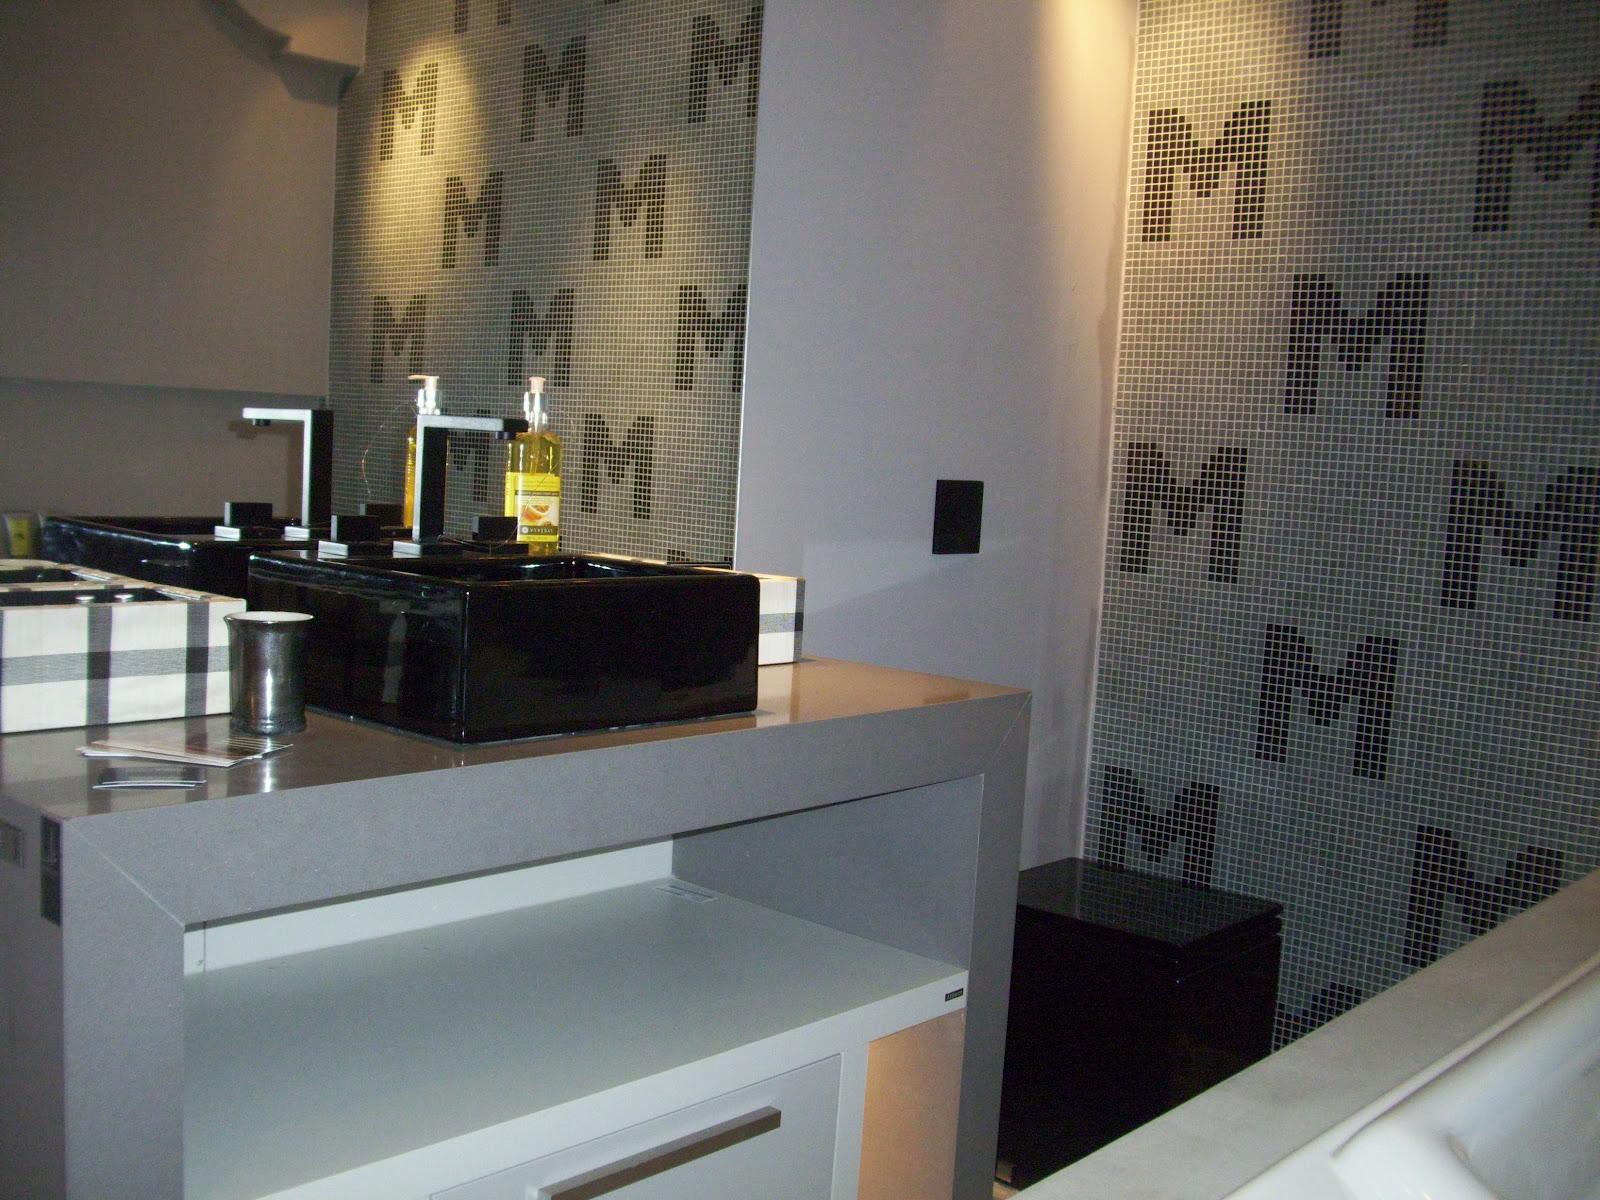 Loft MICHEL TELÓ Casa Cor 2012 LARA SOUSA #9A7731 1600x1200 Banheiro Com Pastilhas Amarelas